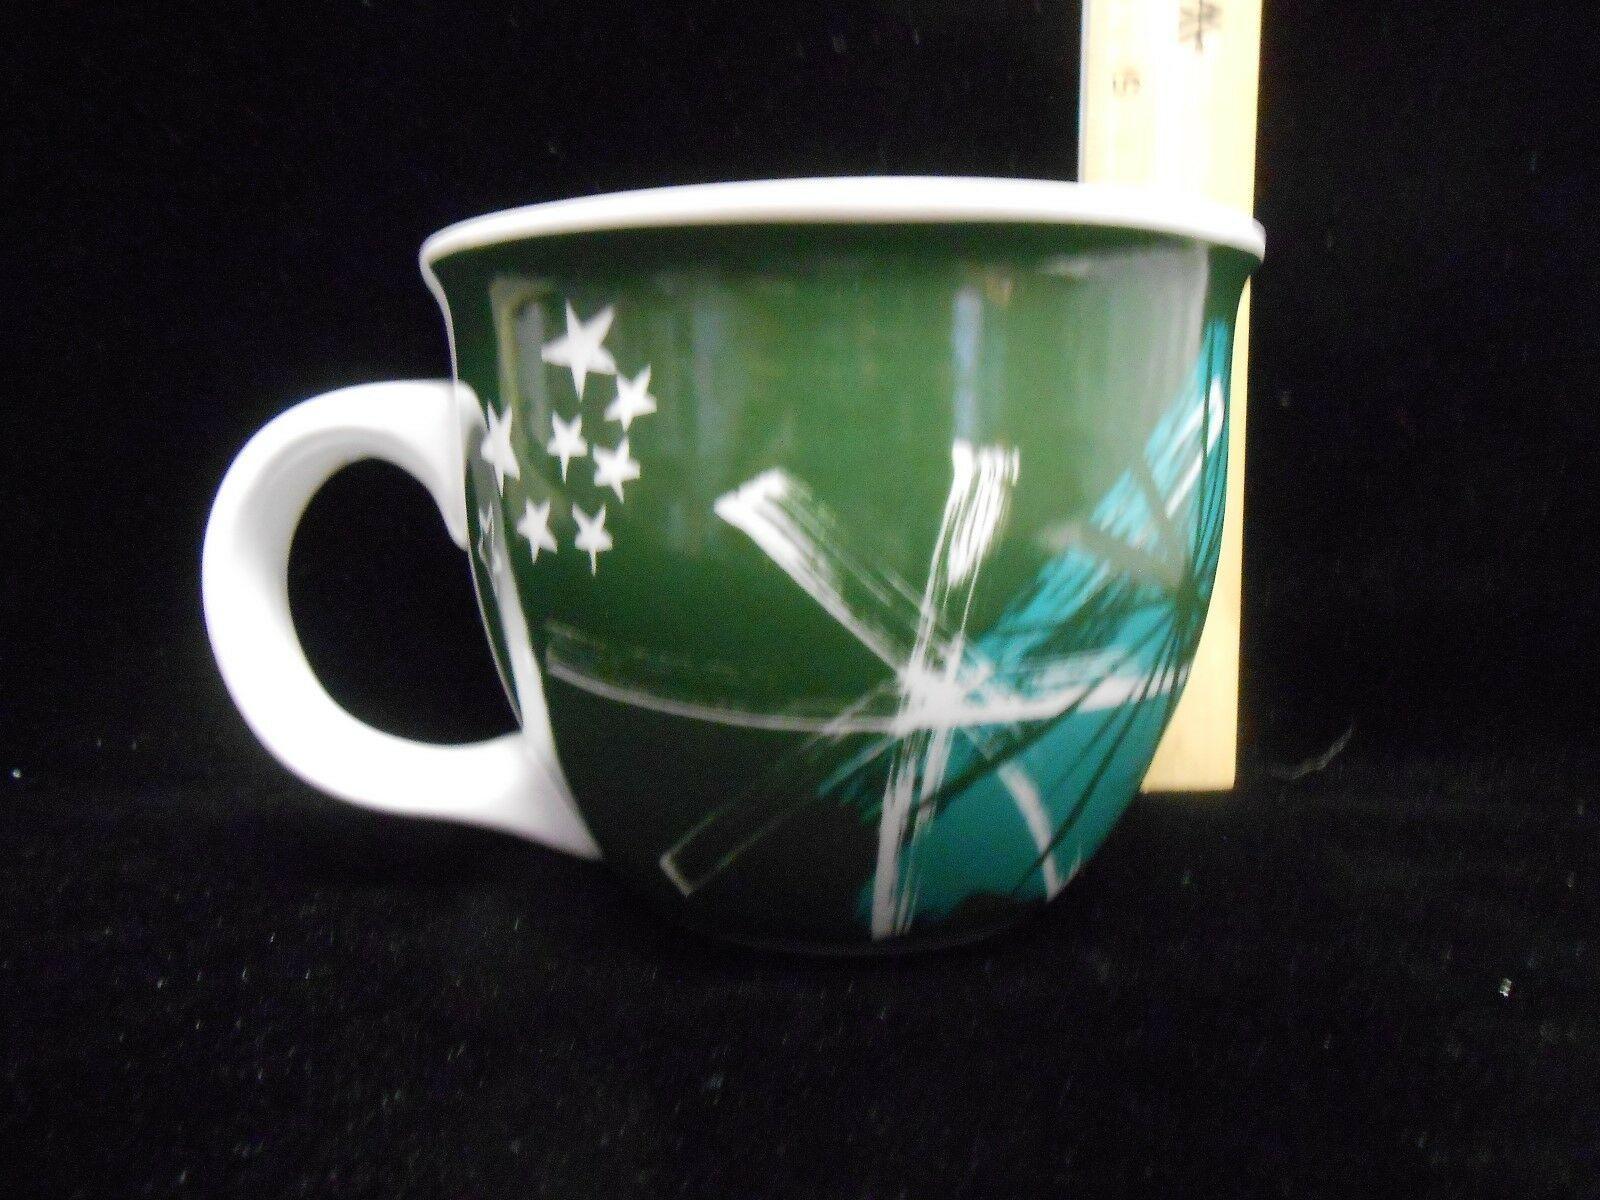 Starbucks Holiday Coffee Mug Cup 2014 14 Oz Green Christmas In 2020 Holiday Coffee Starbucks Coffee Beans Best Starbucks Coffee